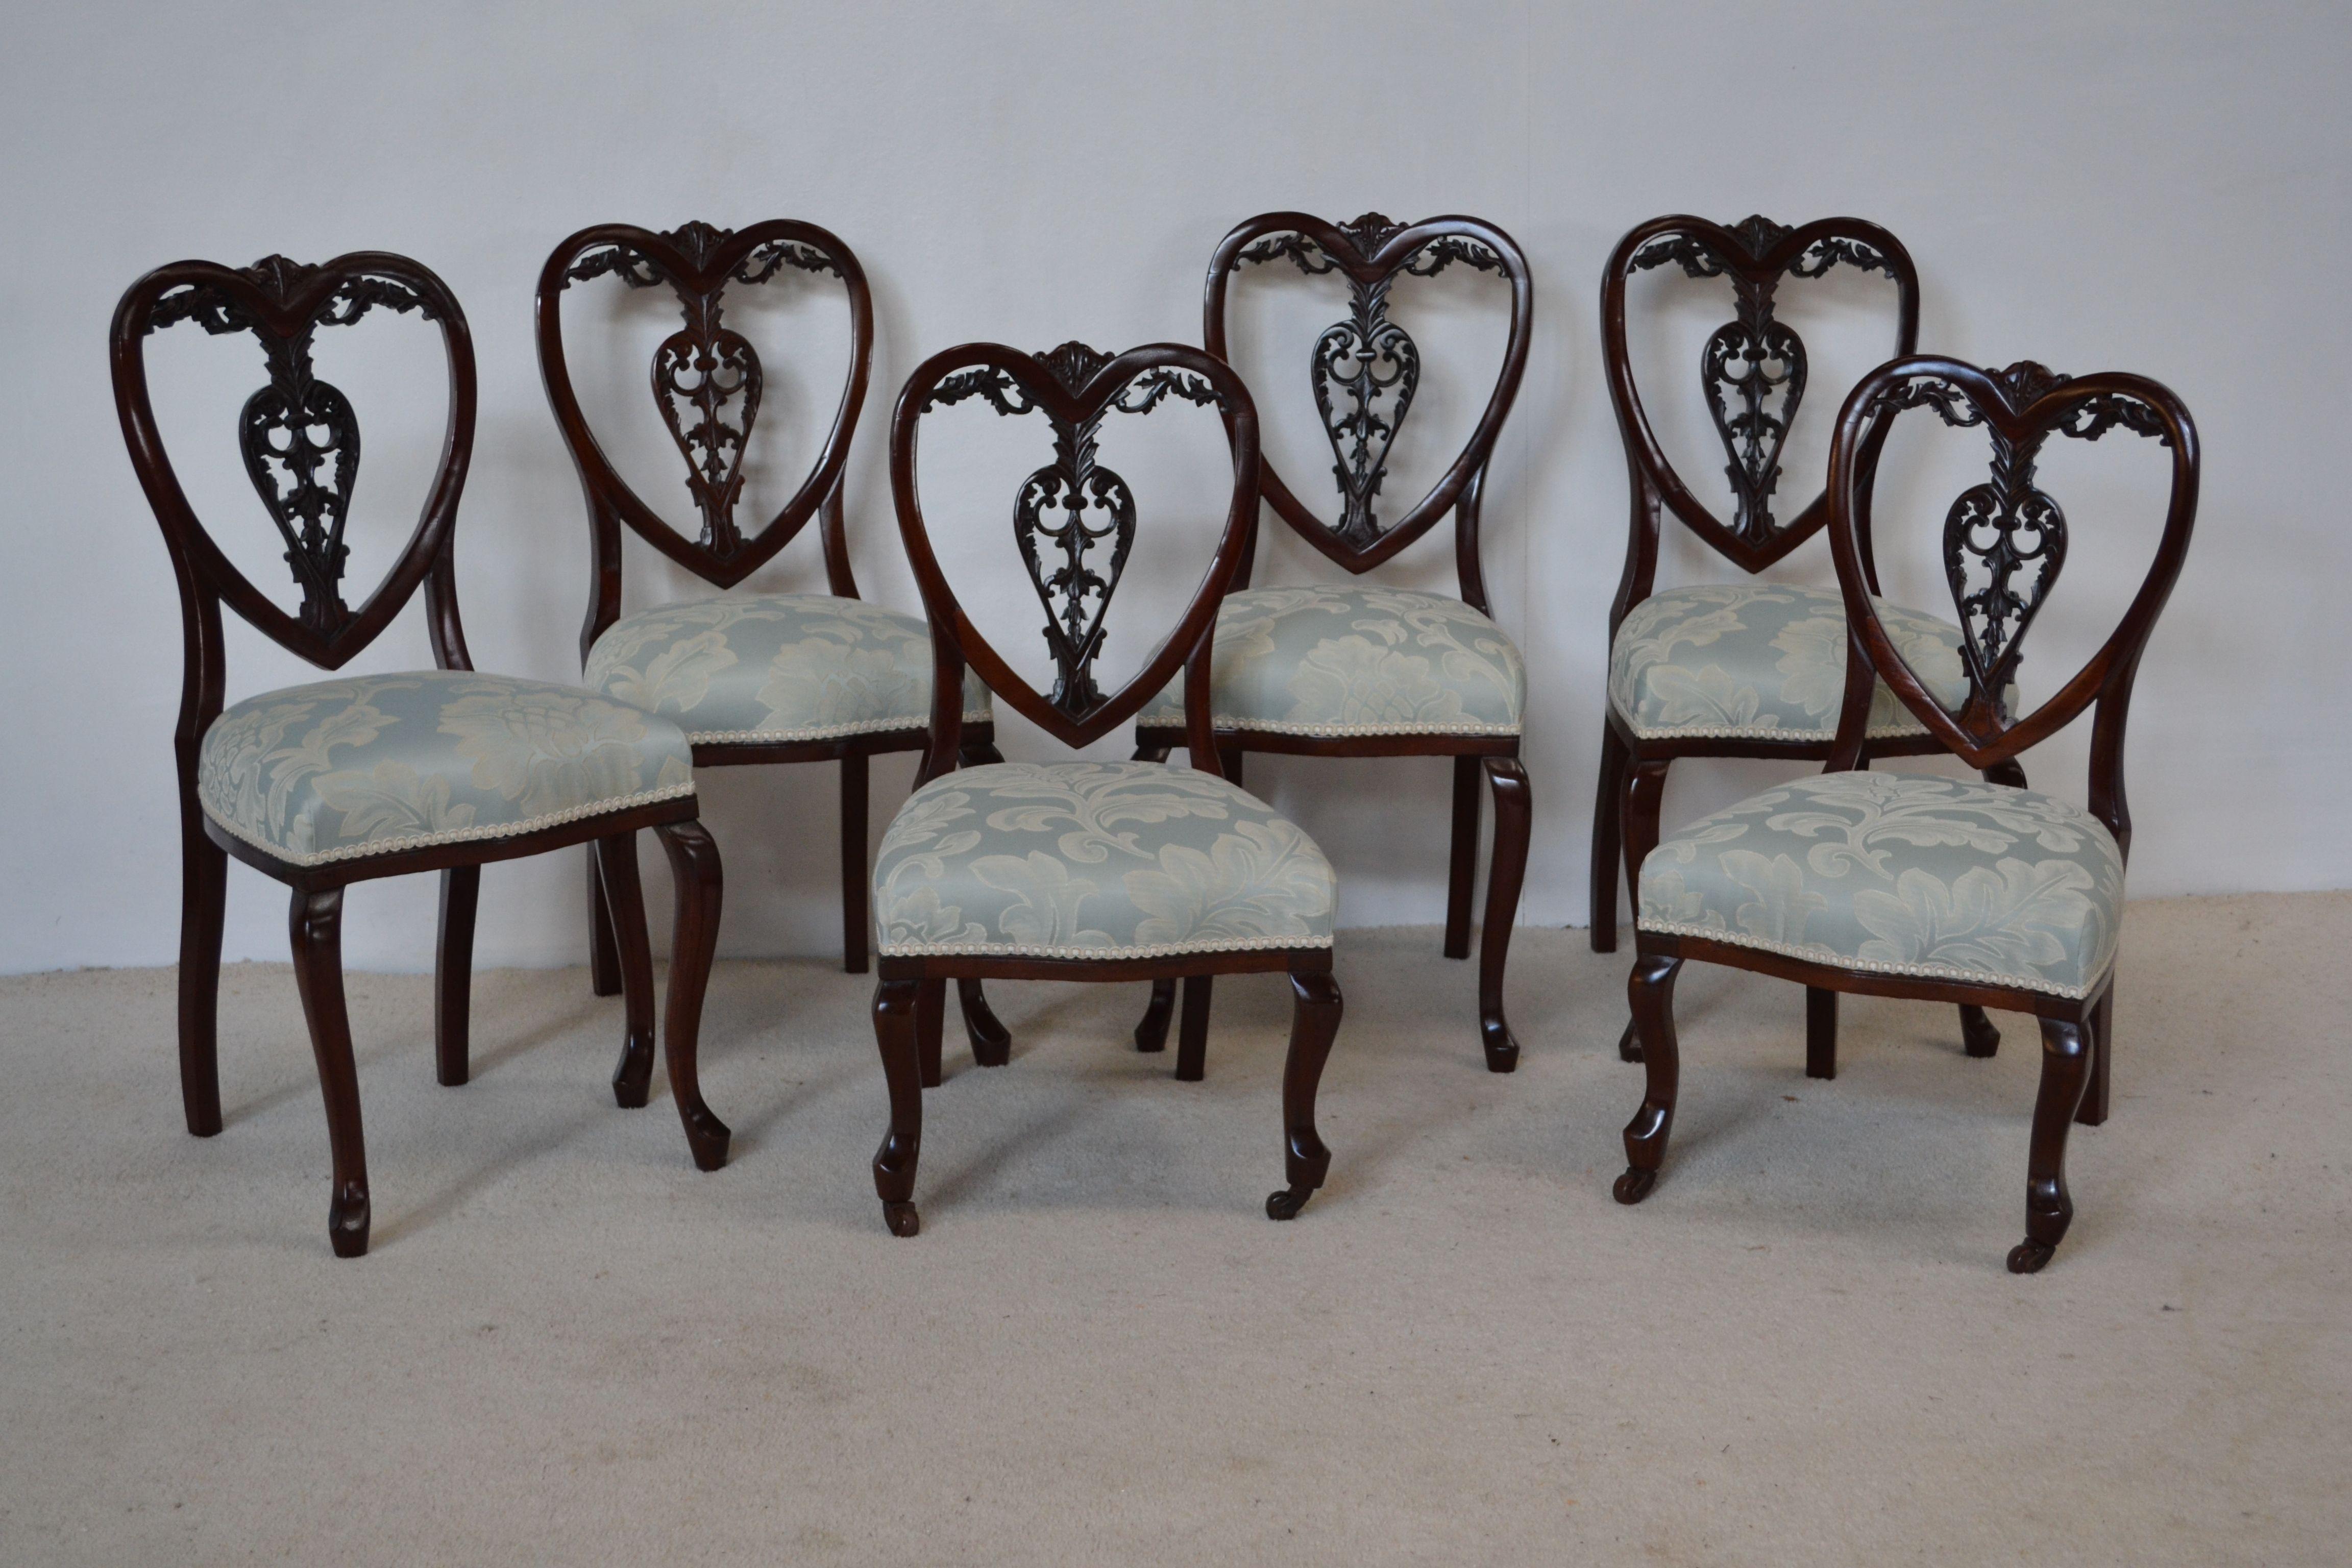 Sedie Veneziane ~ 6 sedie veneziane del 700. rarissime e spiritose laccate a